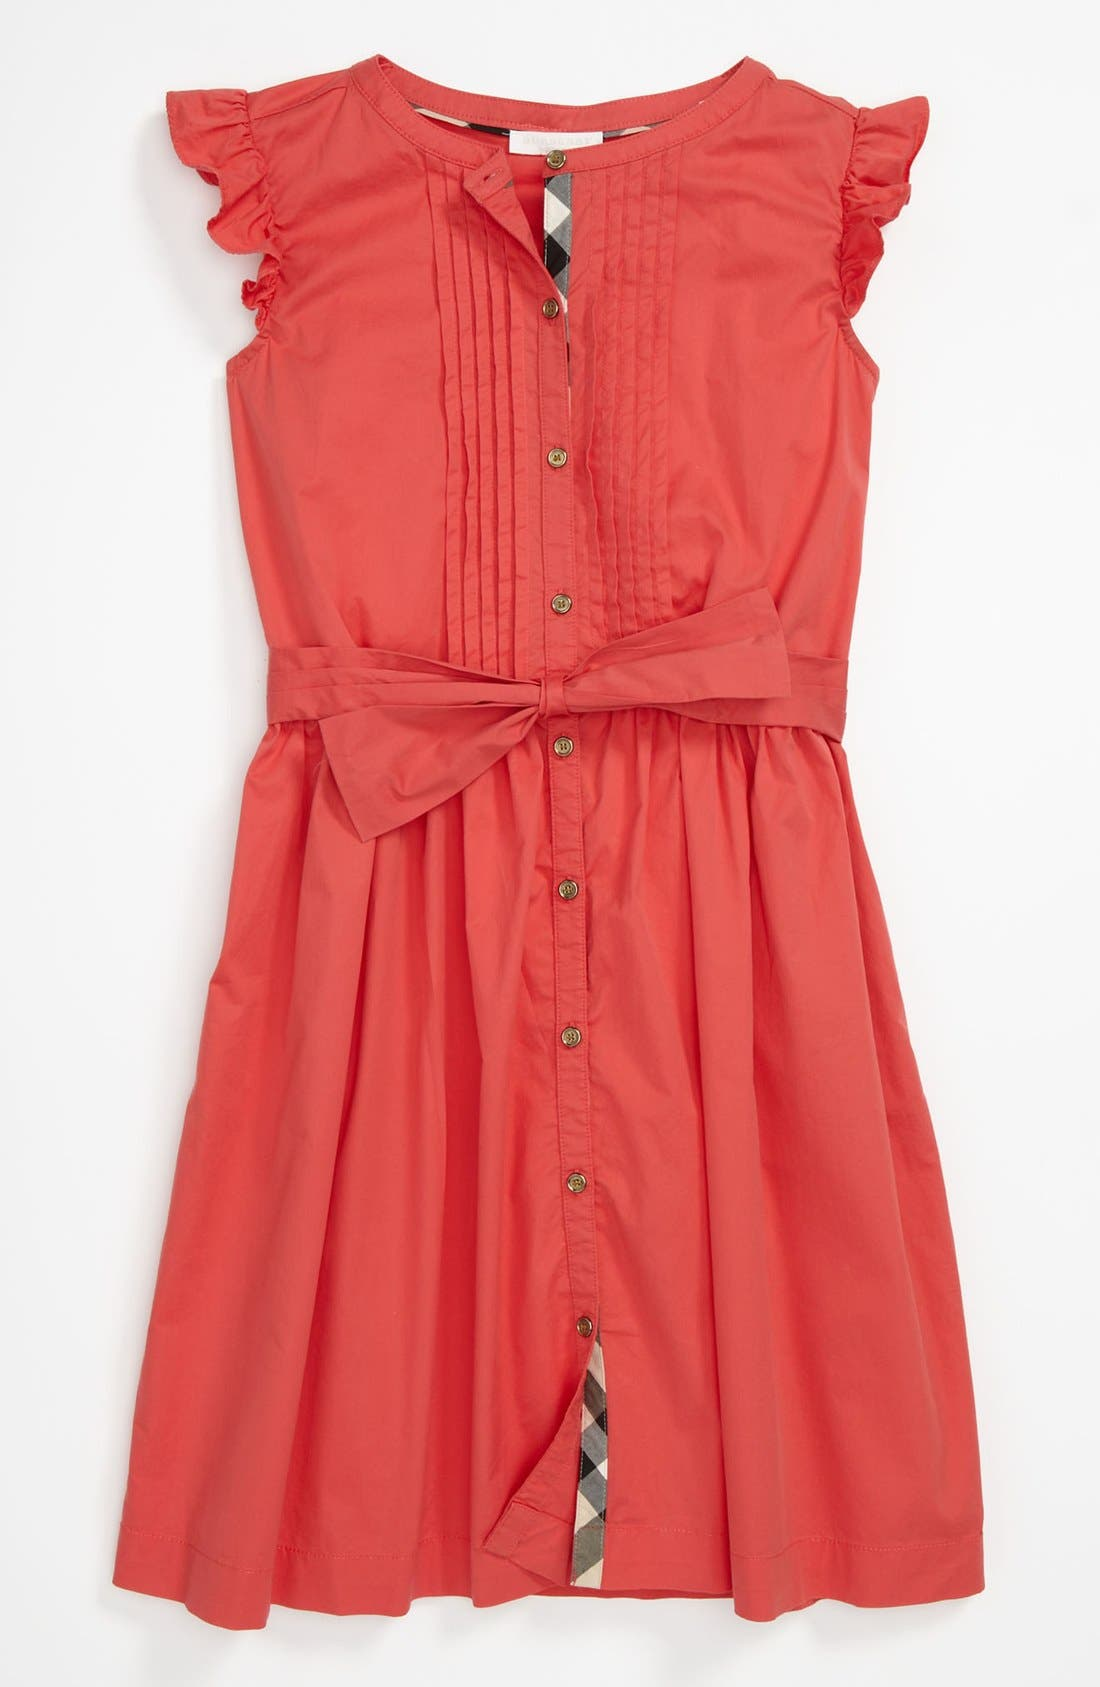 Alternate Image 1 Selected - Burberry 'Estella' Dress (Little Girls & Big Girls)